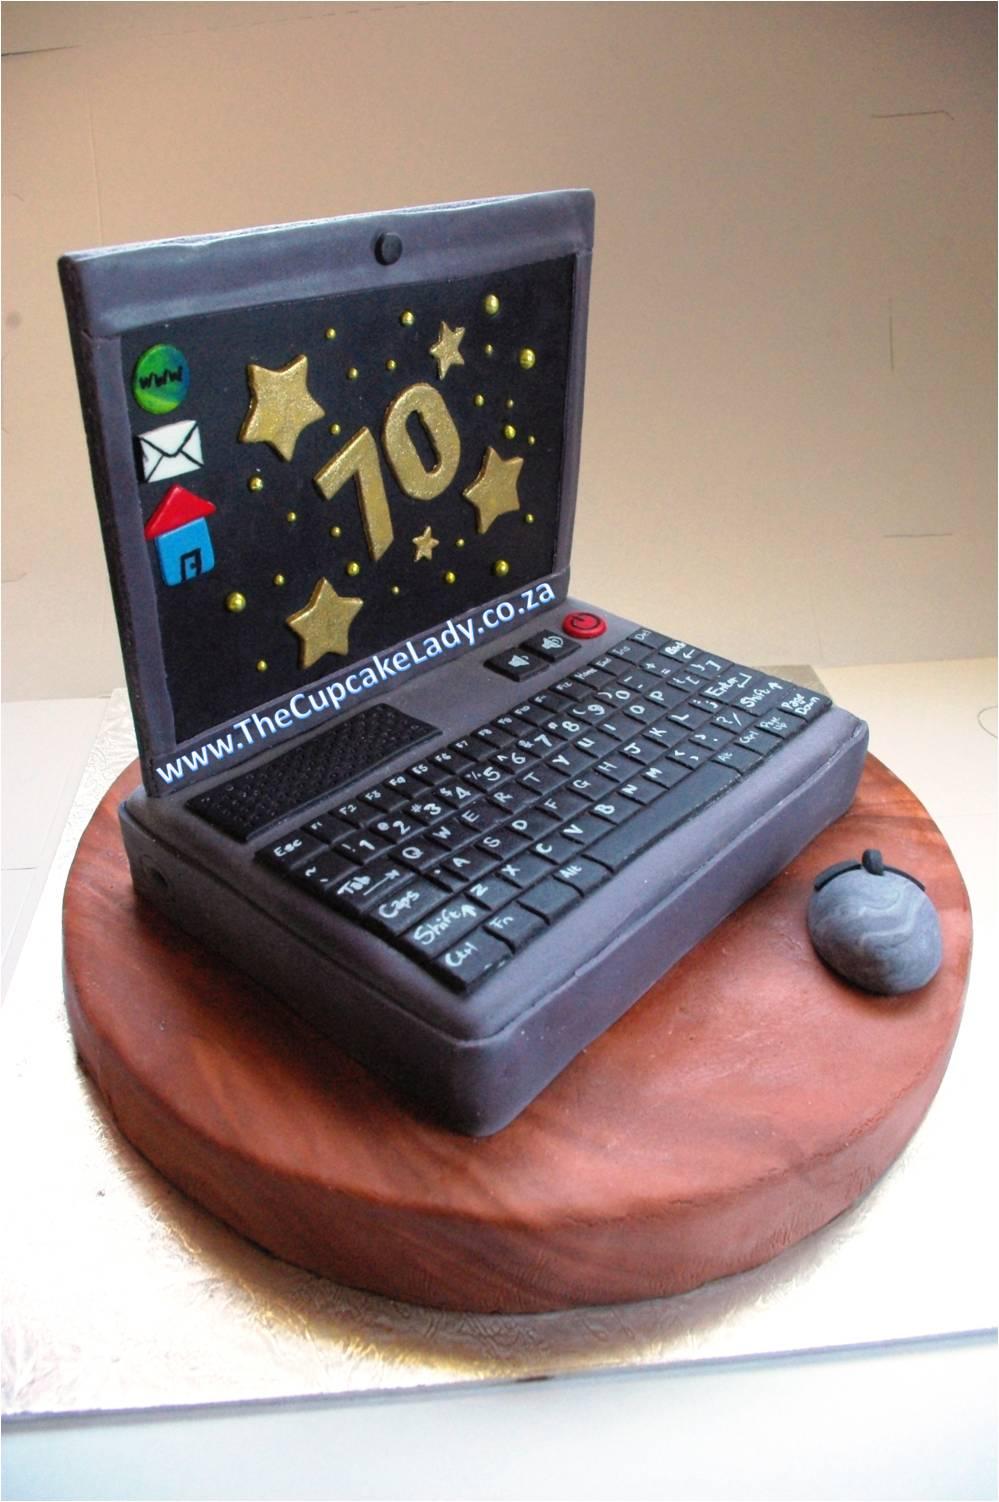 Macbook Pro Cake